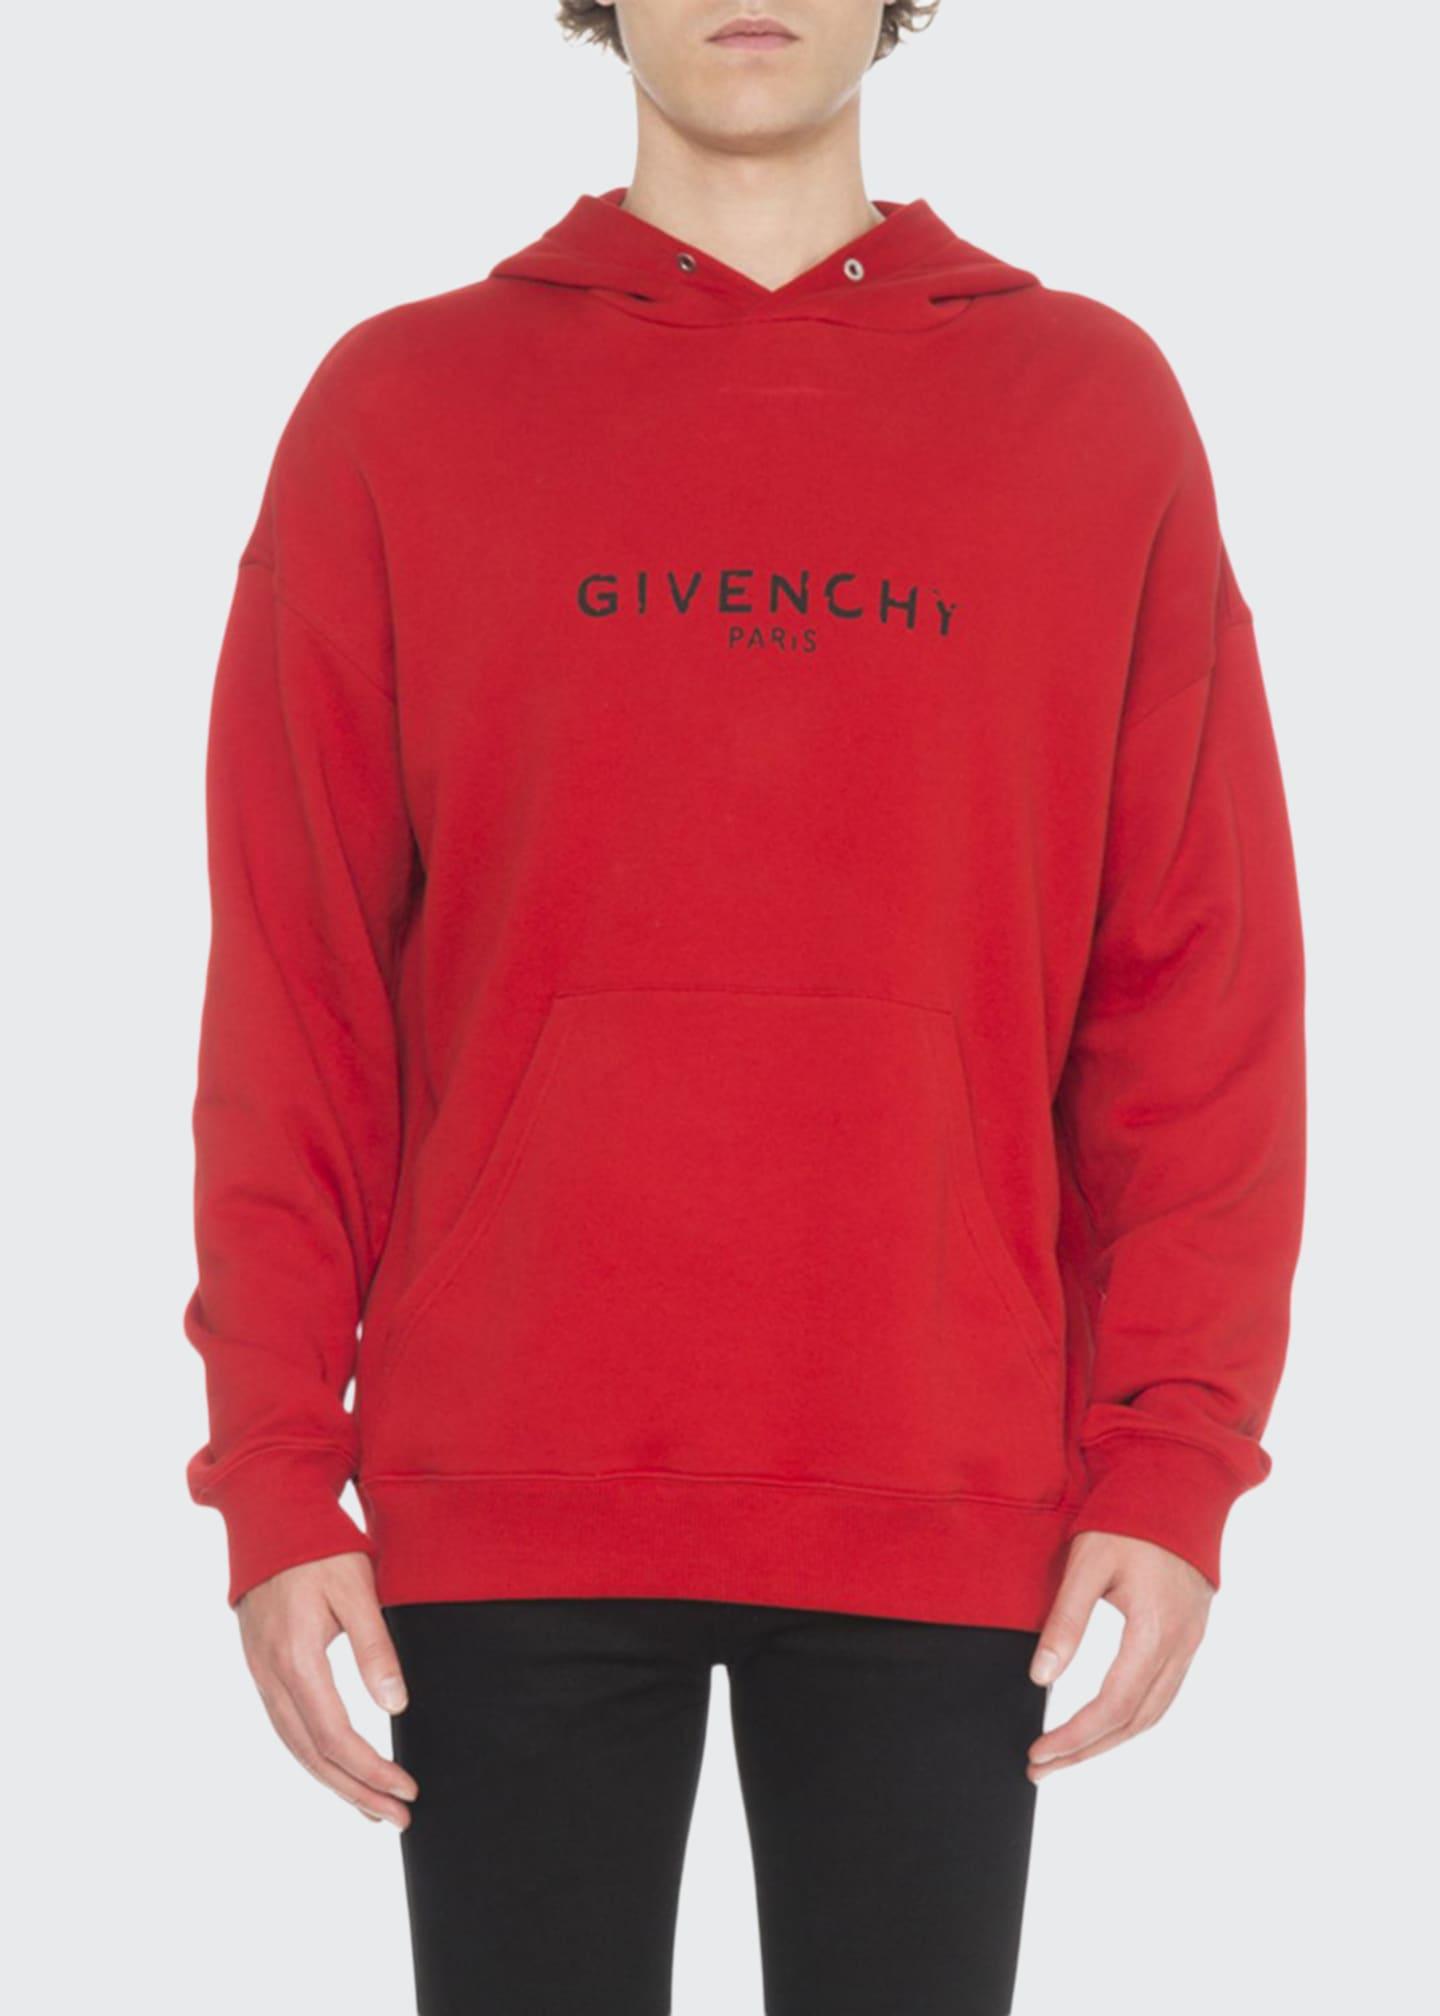 Givenchy Men's Distressed Logo-Print Hoodie Sweatshirt